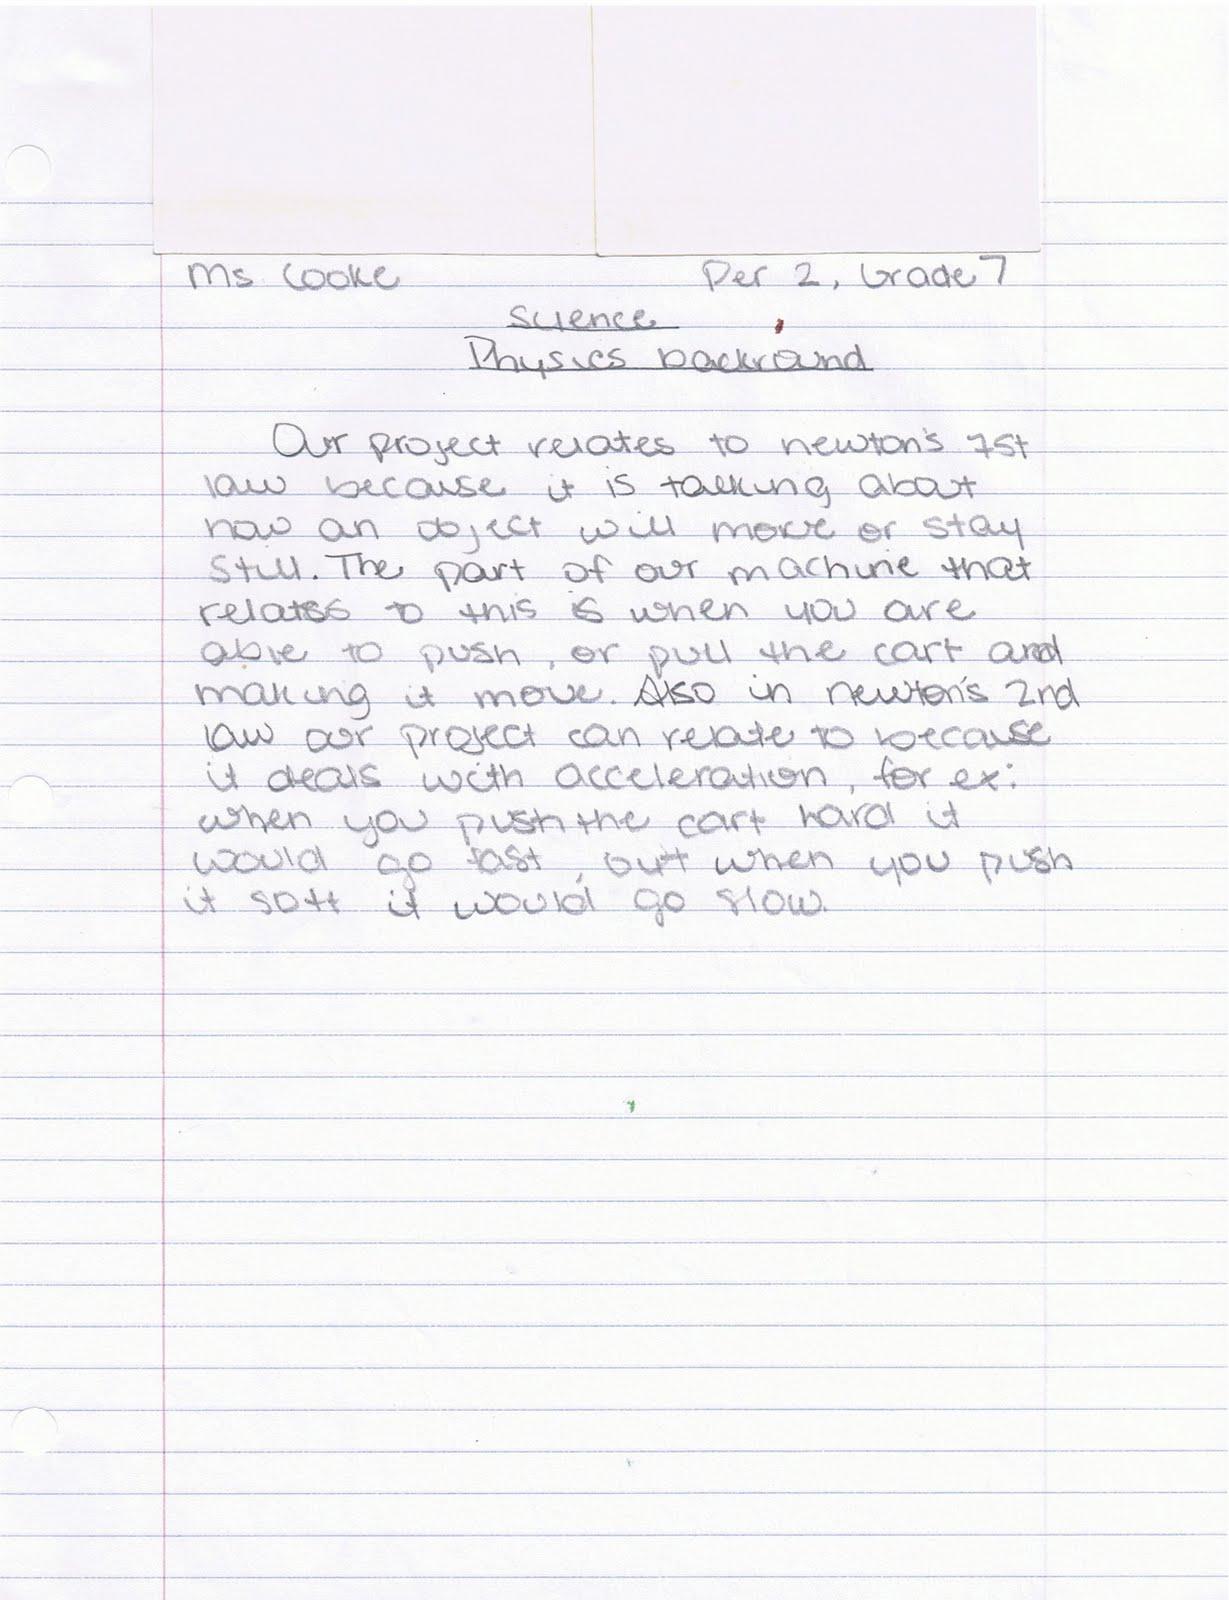 6th grade science jennifer m tatianas physics background jennifer m tatianas physics background sciox Image collections